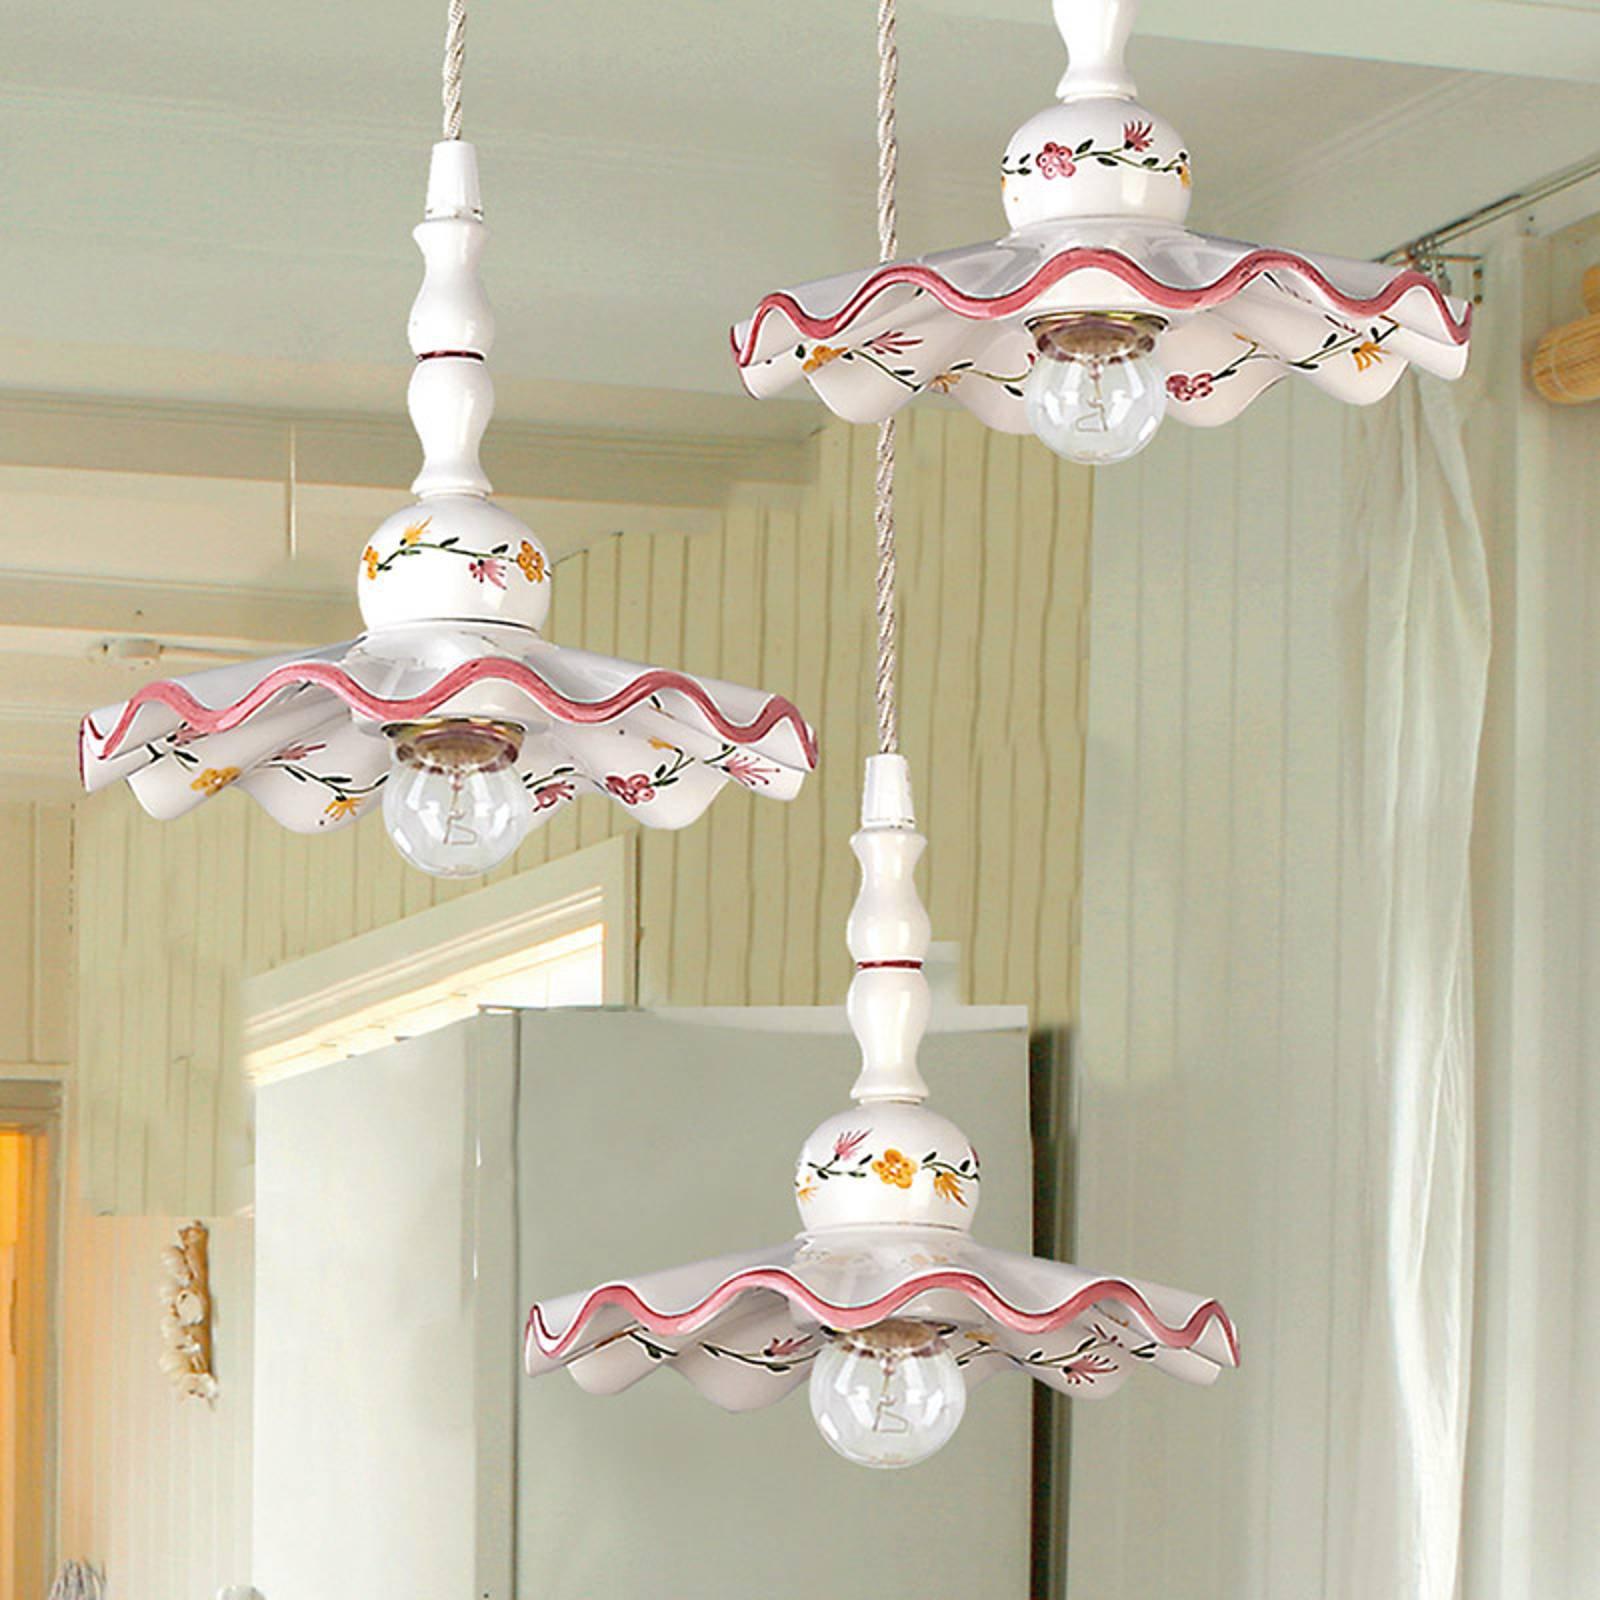 Keramisk hengelampe Ametista i rustikk stil, 3 lys